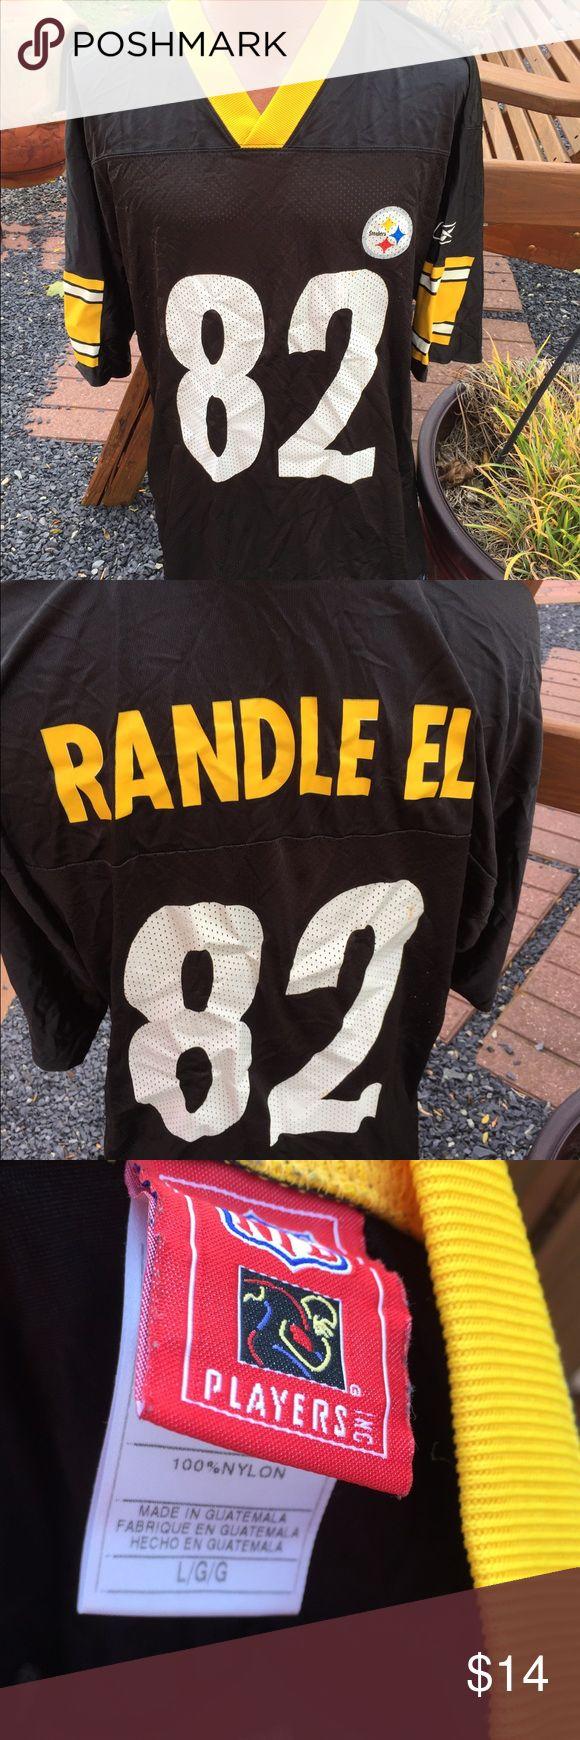 Steelers Antwaan Randle El Reebok Jersey Size L Size large. Does have a few spots as shown. Reebok Shirts